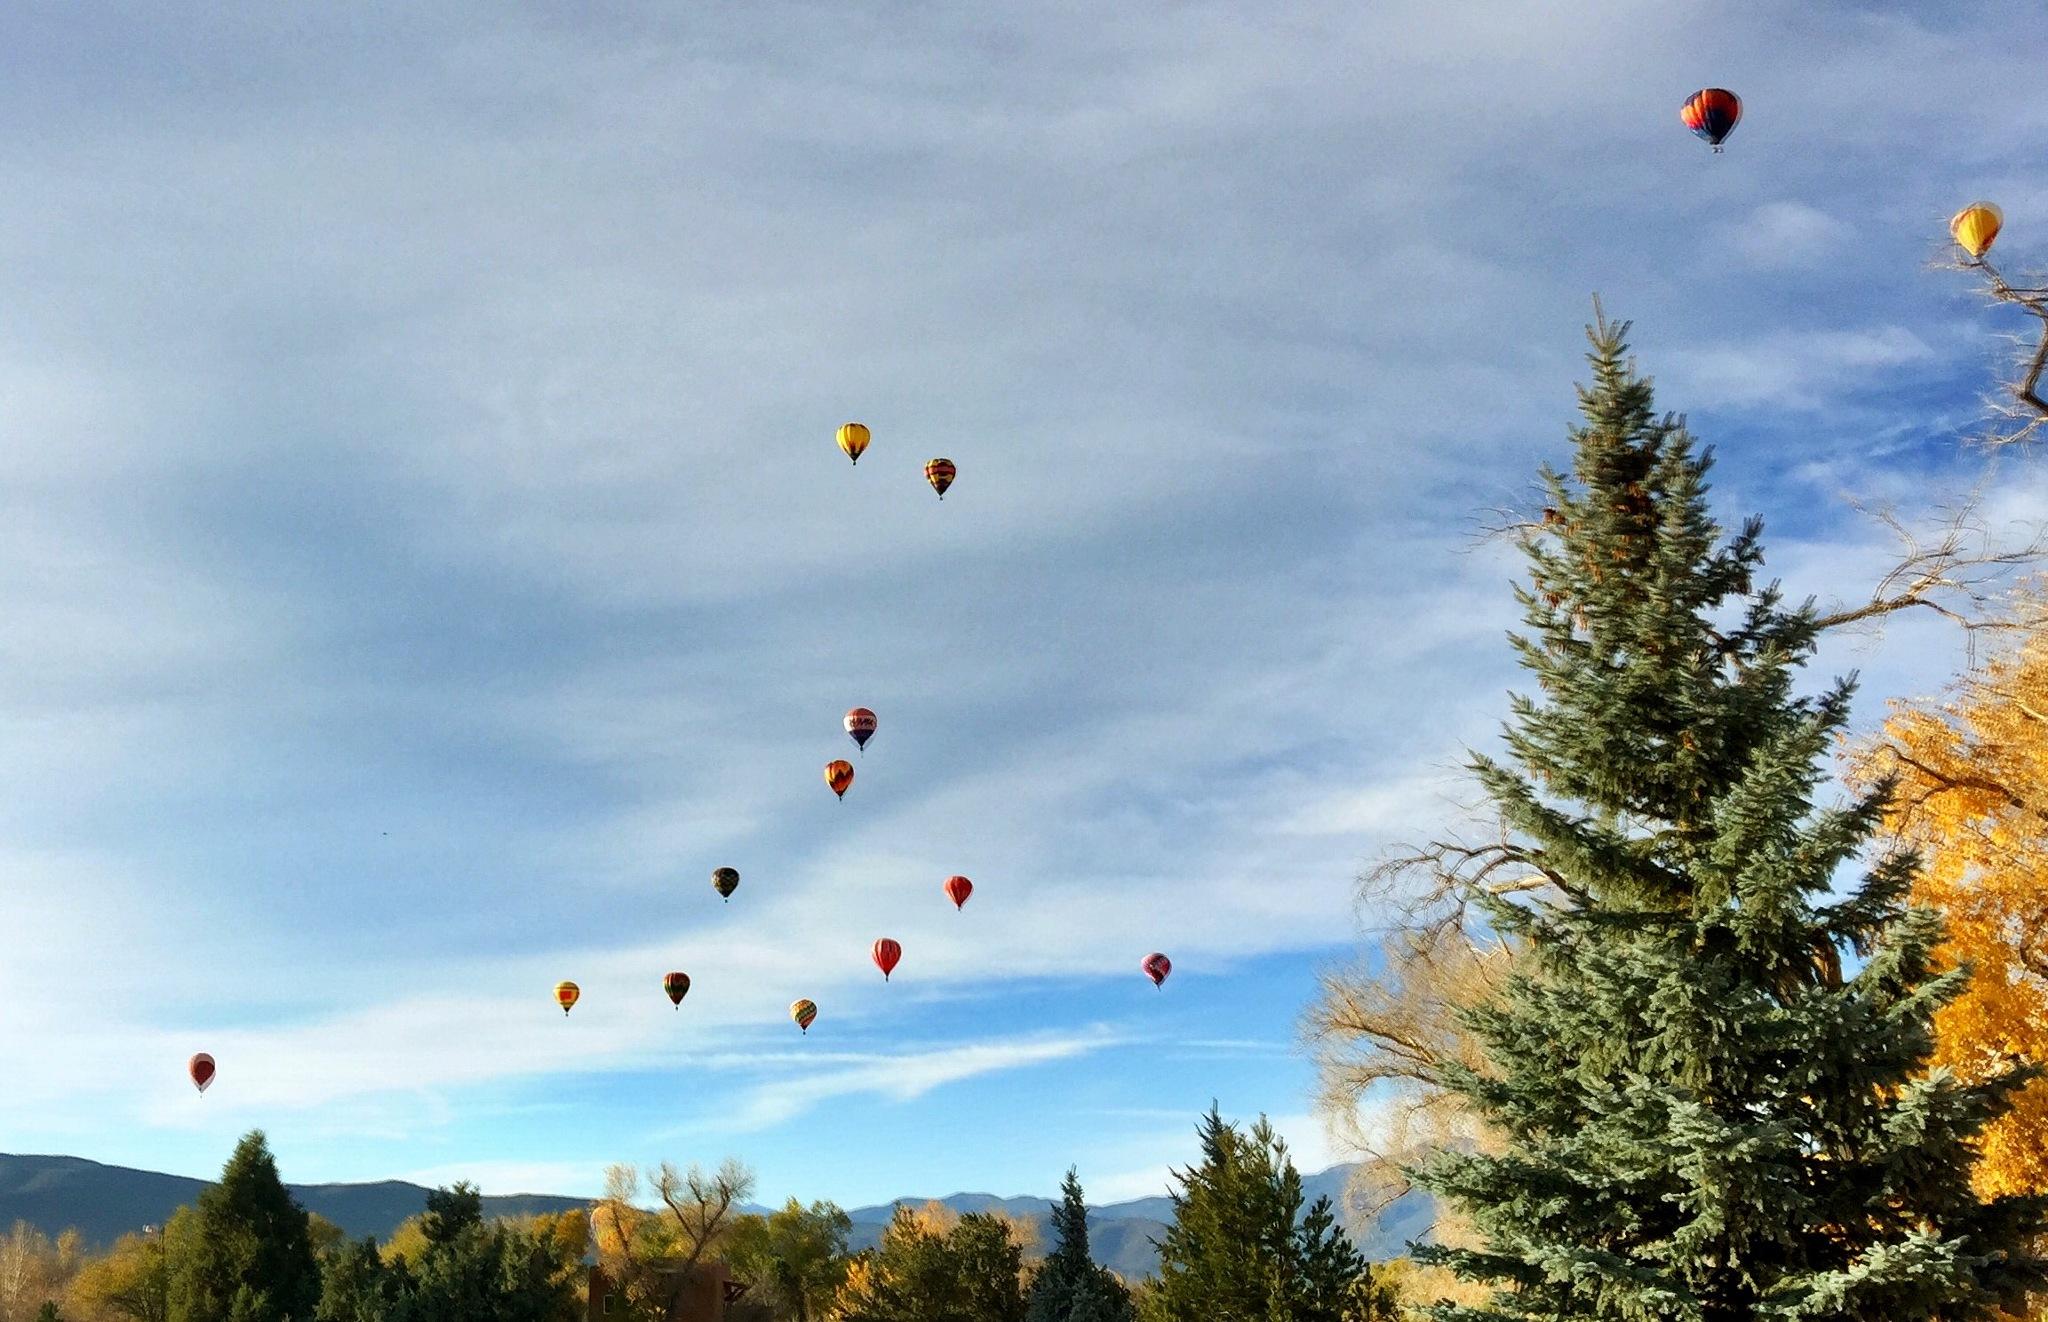 Taos hot air balloons by emsphotonut41